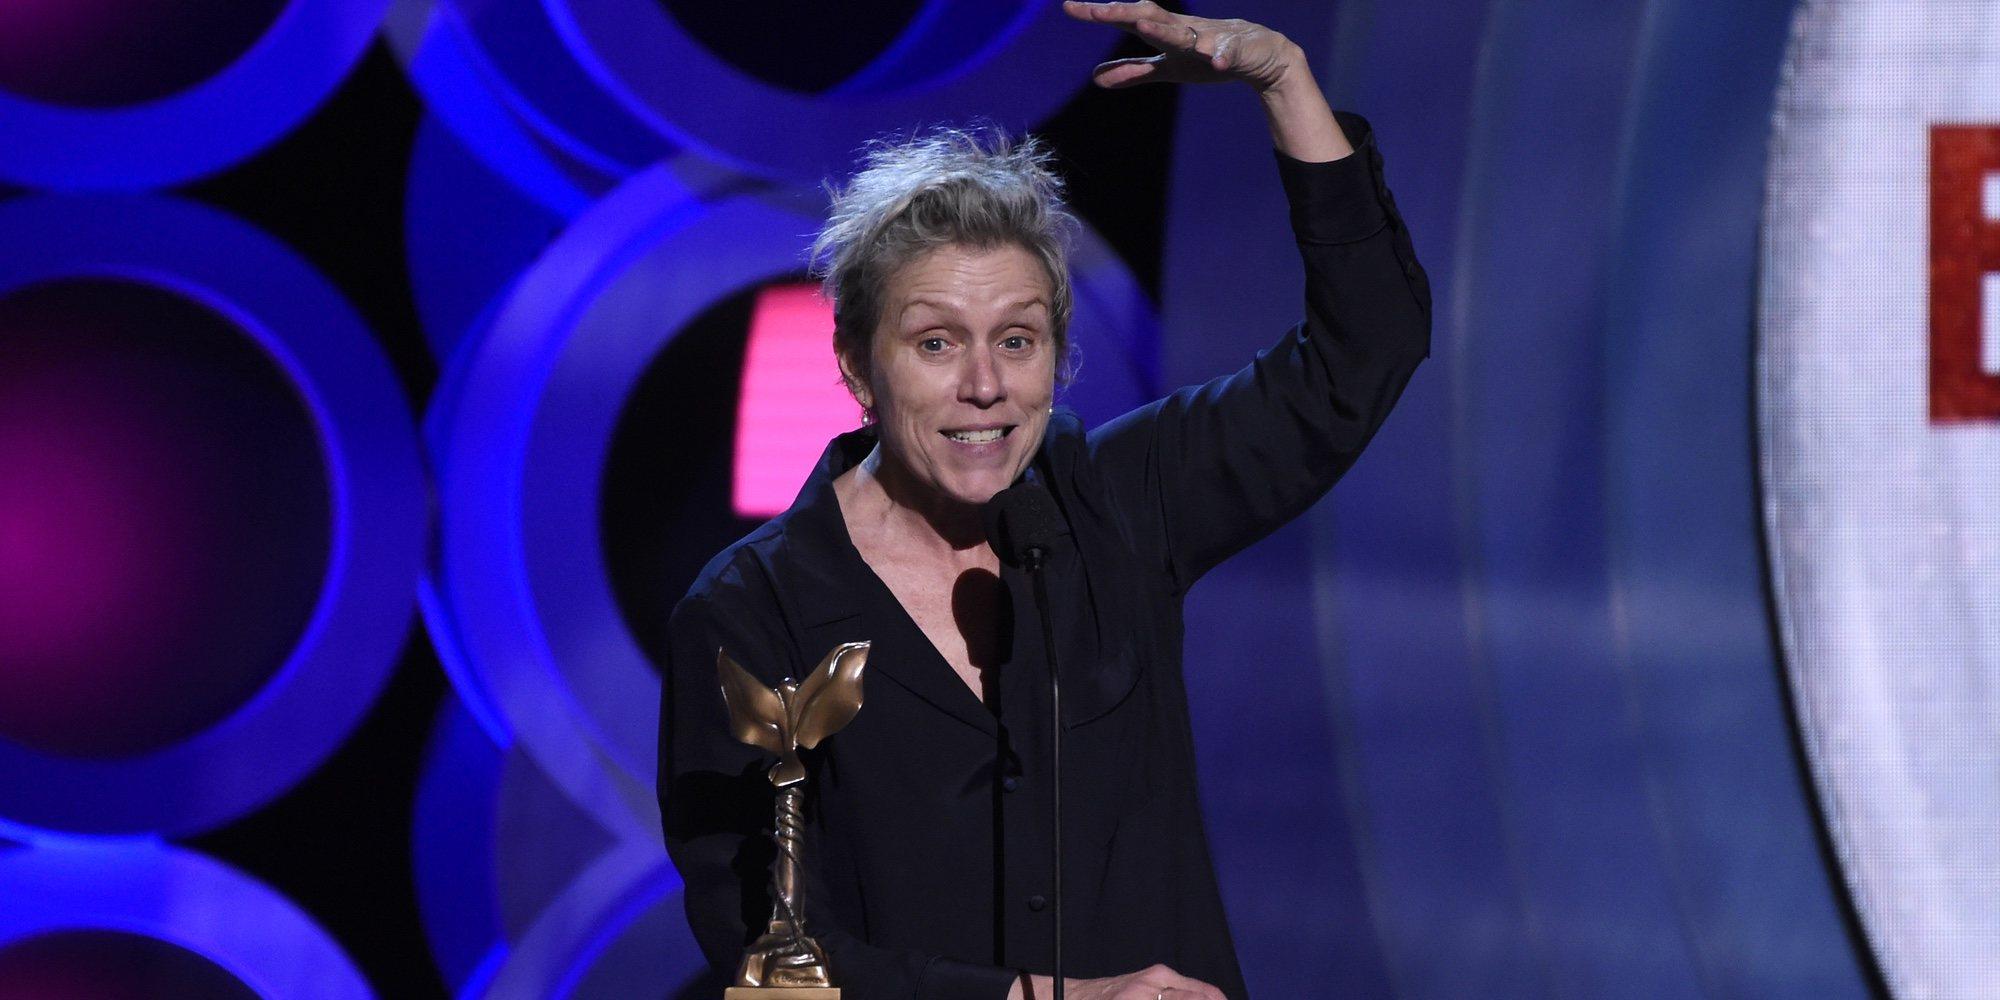 El polémico discurso de Frances McDormand en los Independent Spirit Awards